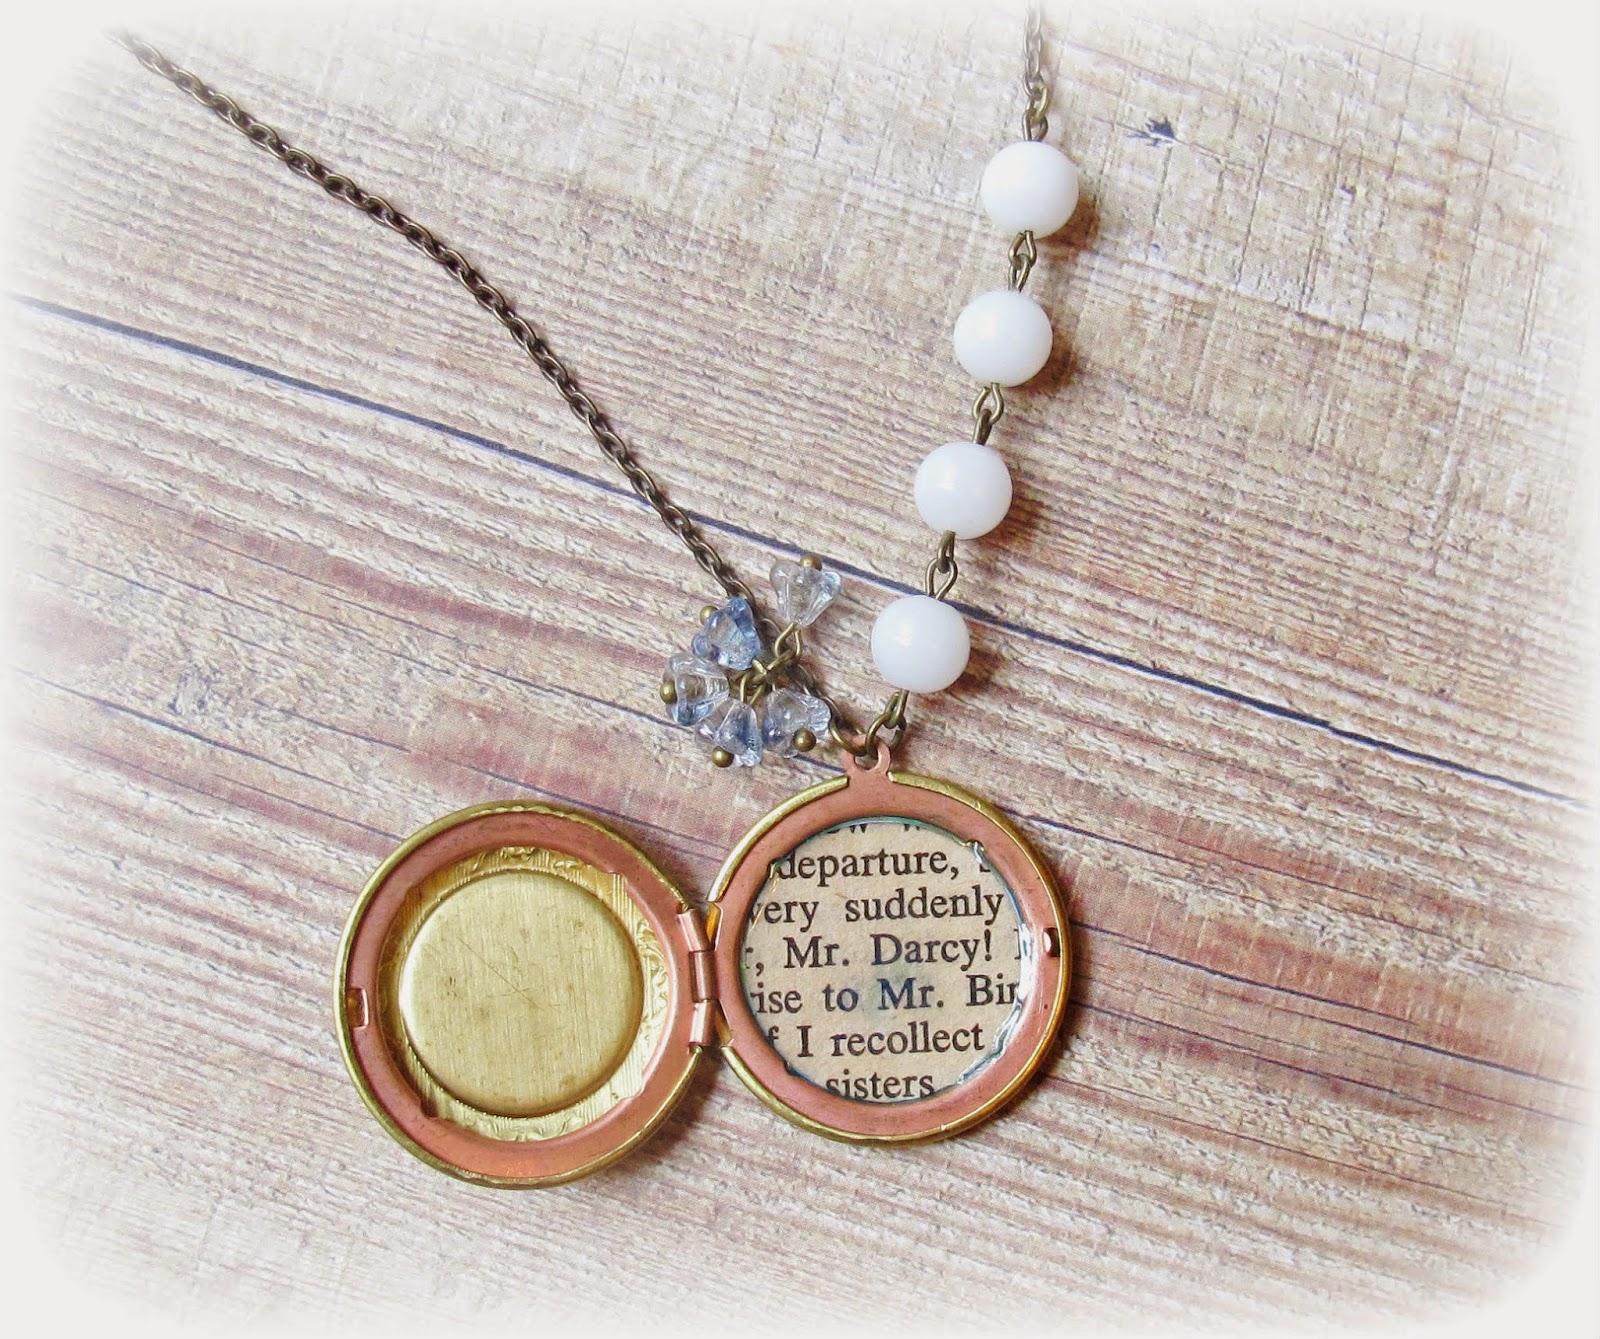 image mr darcy locket necklace pride and prejudice jane austen brass blue white vintage